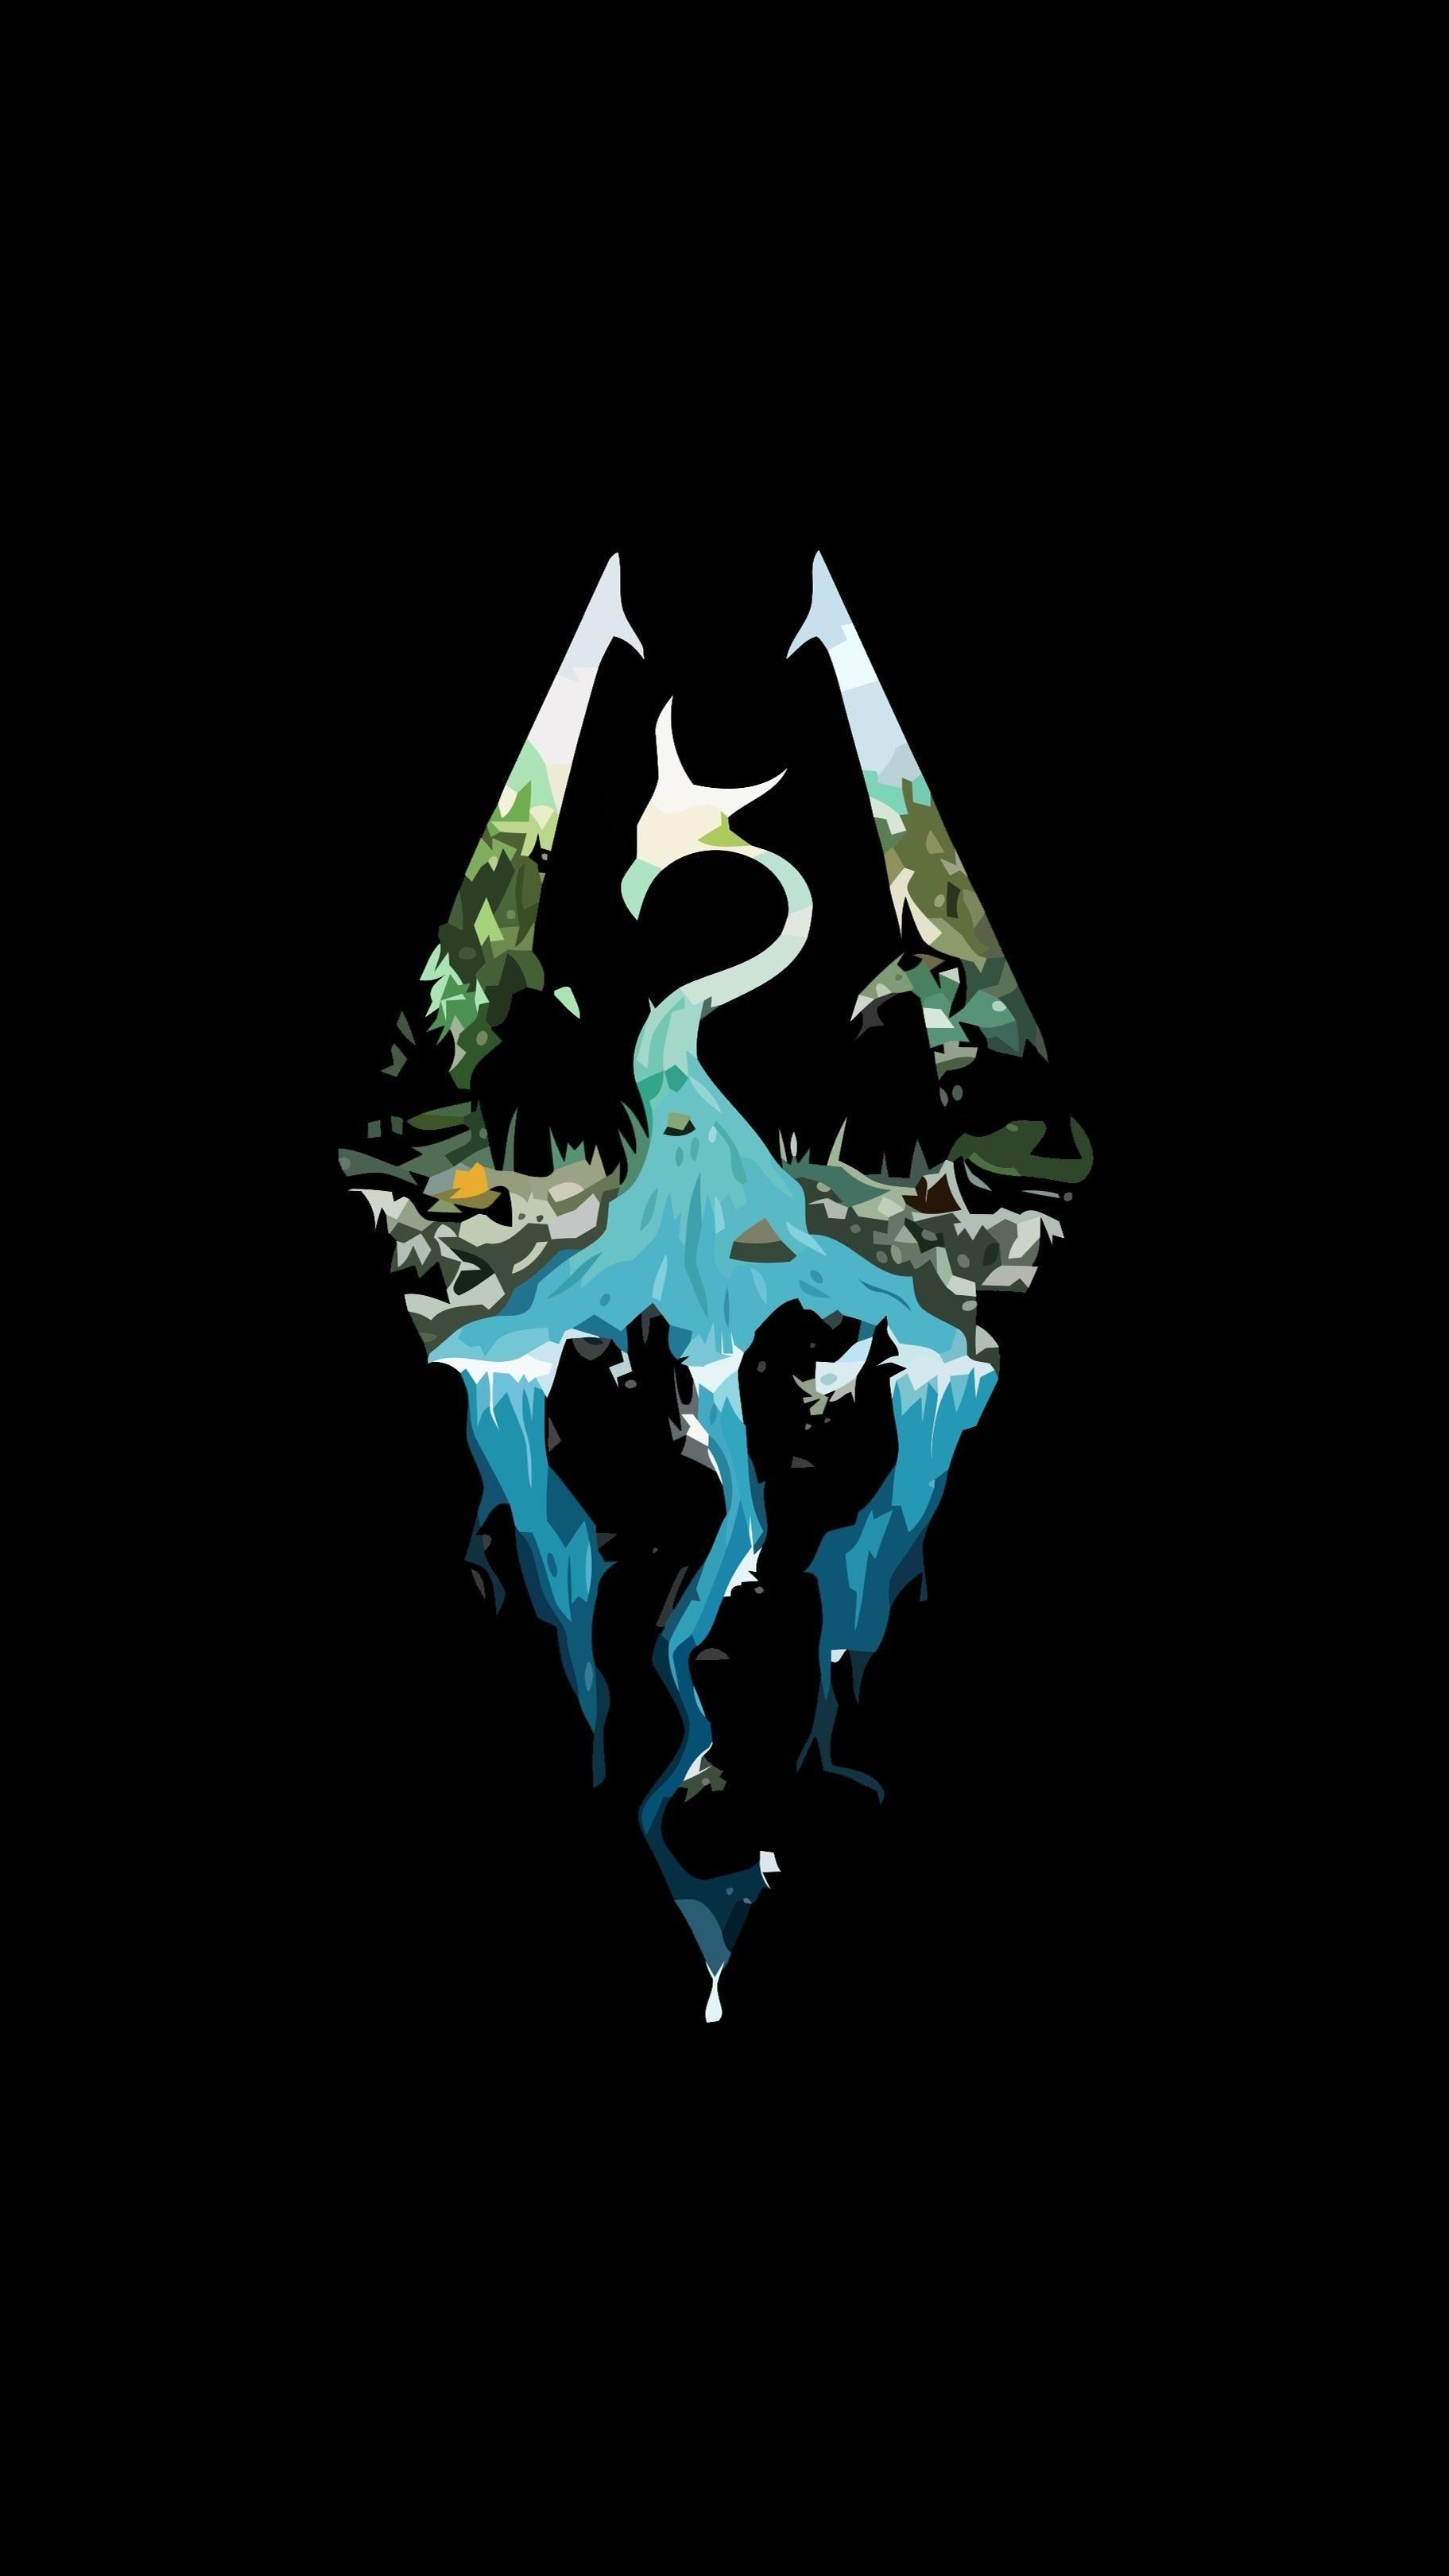 Res: 1823x3240, Phone wallpaper Skyrim logo #games #Skyrim #elderscrolls #BE3 #gaming  #videogames #Concours #NGC